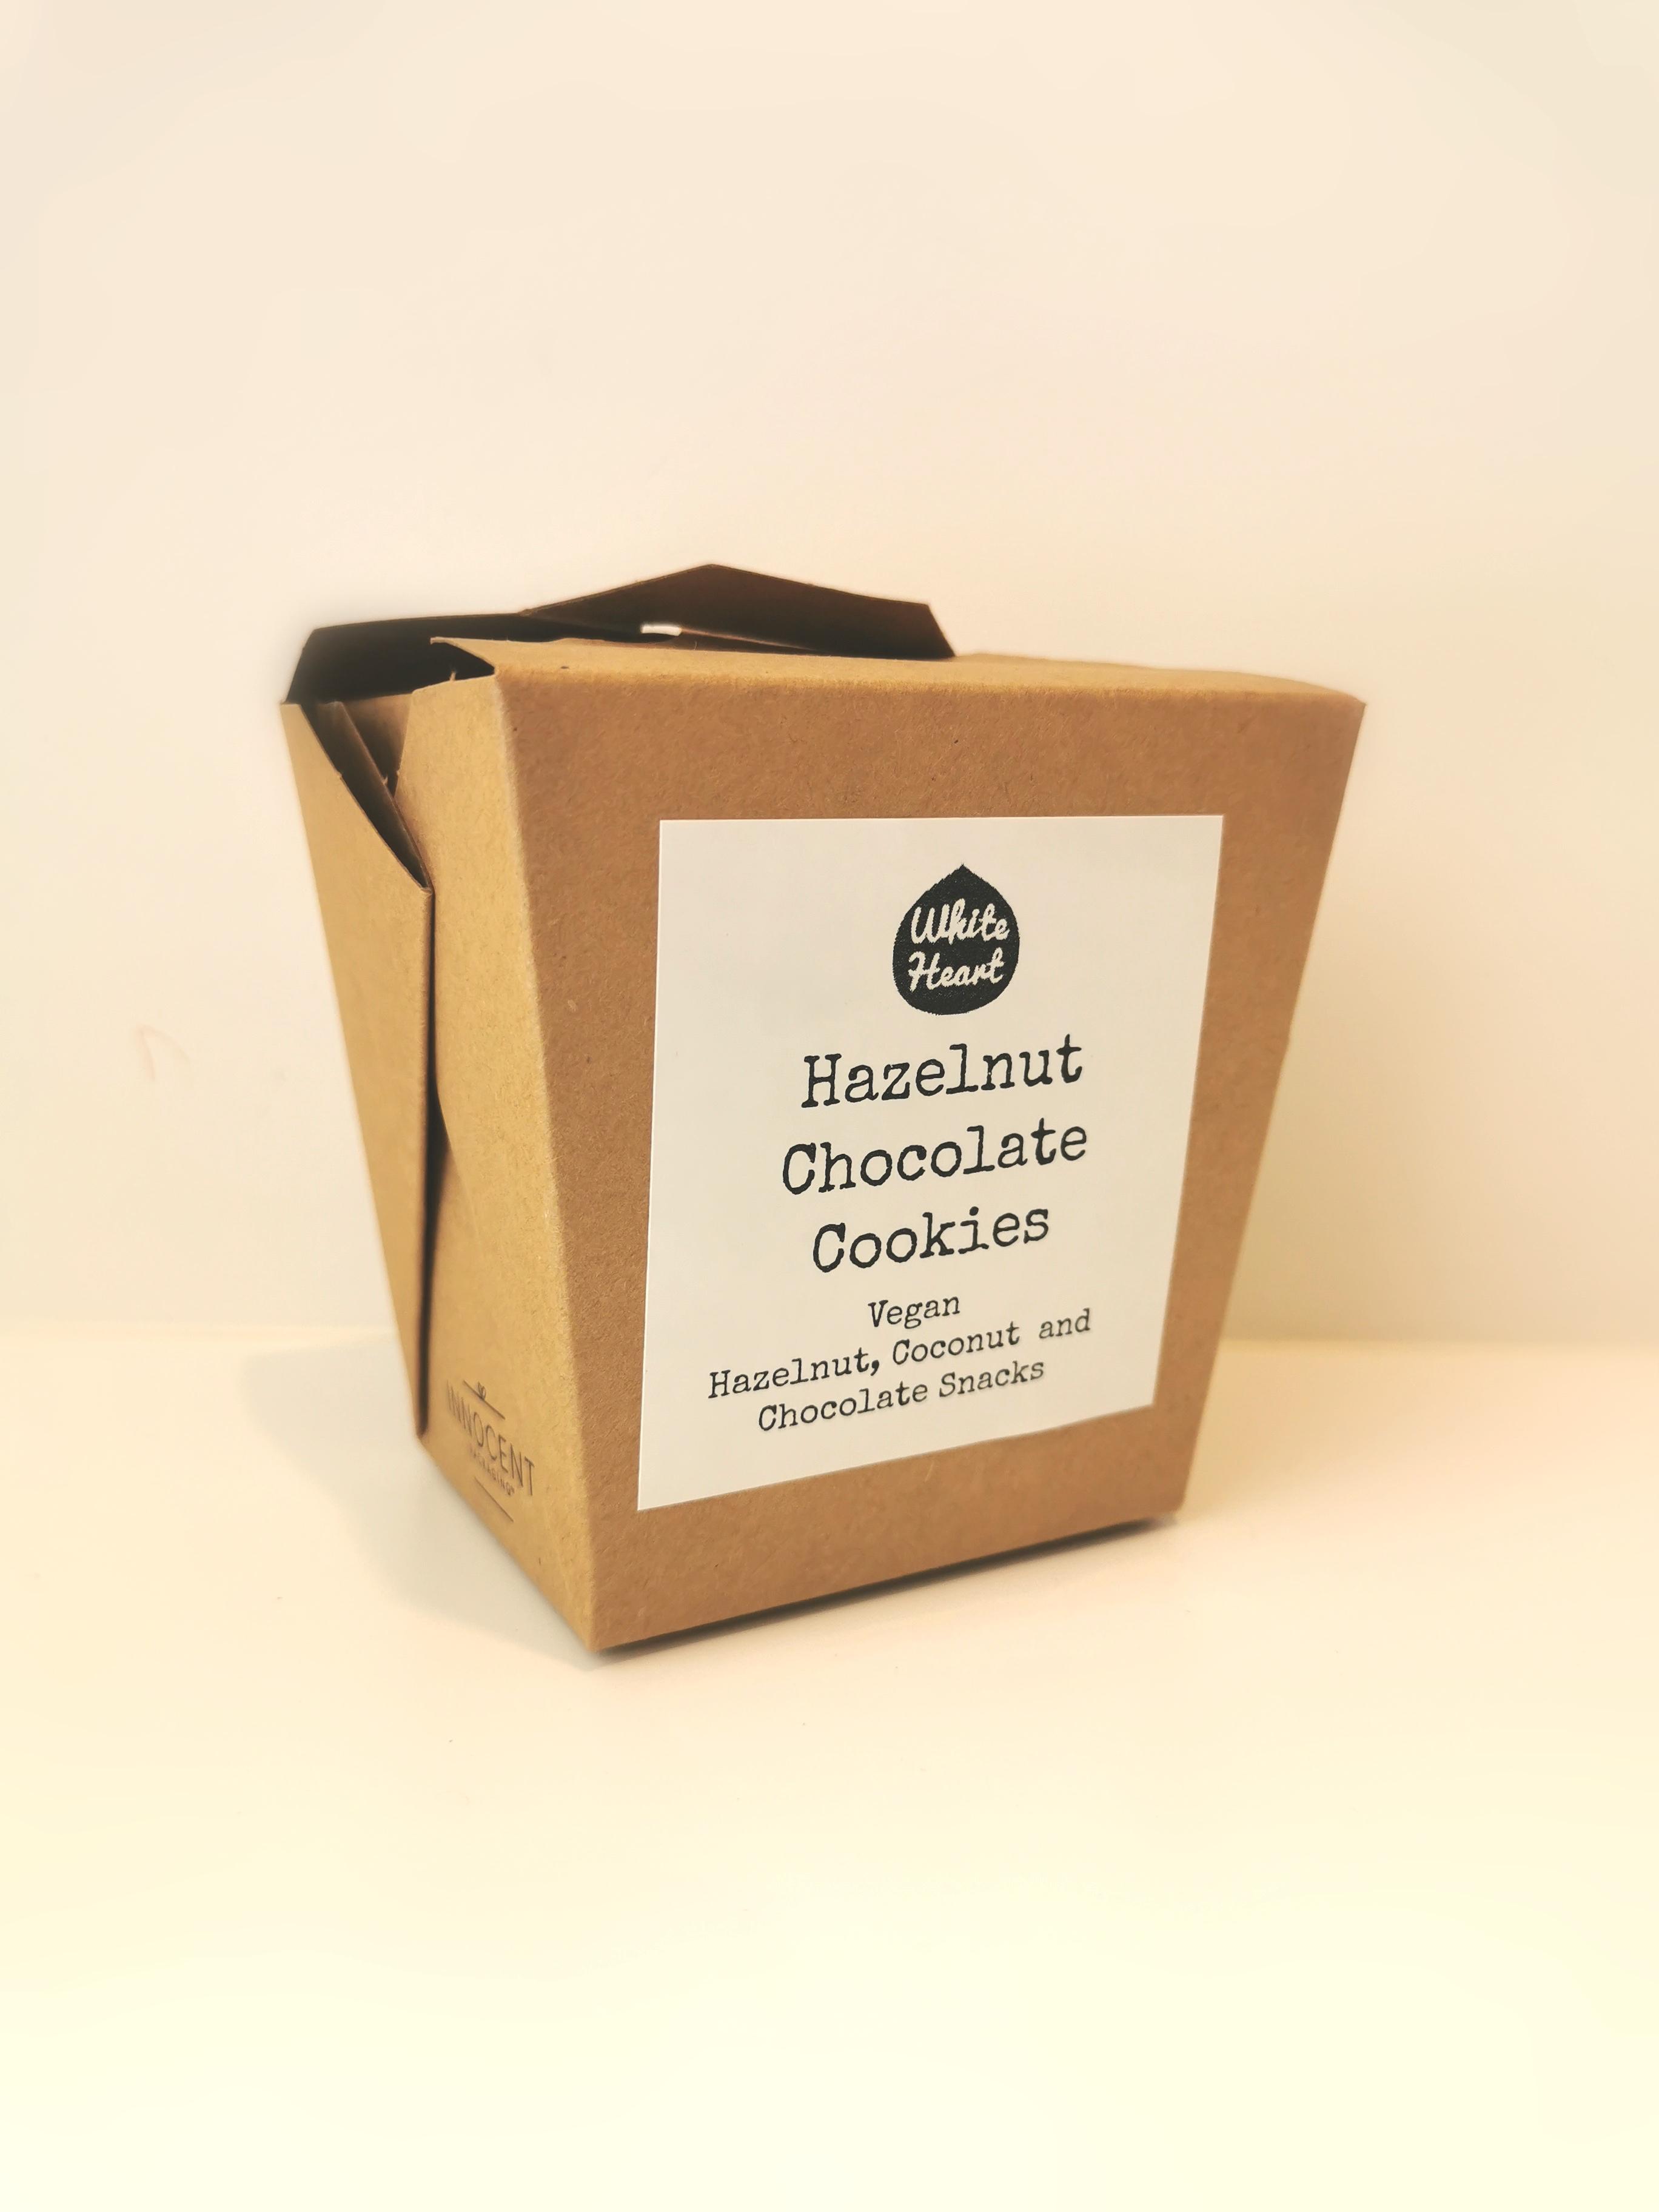 HAZELNUT CHOCOLATE COOKIES